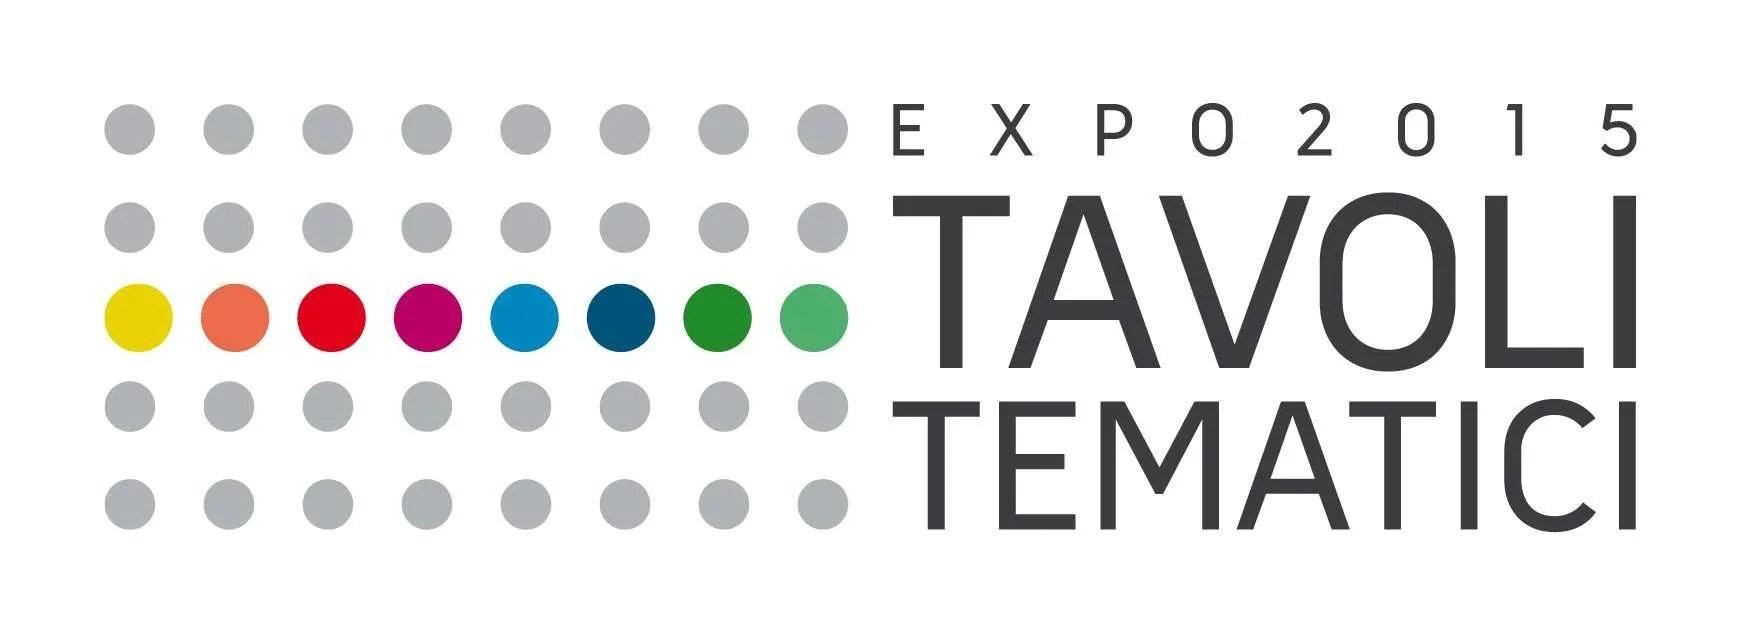 Expo 2015 Tavoli Tematici